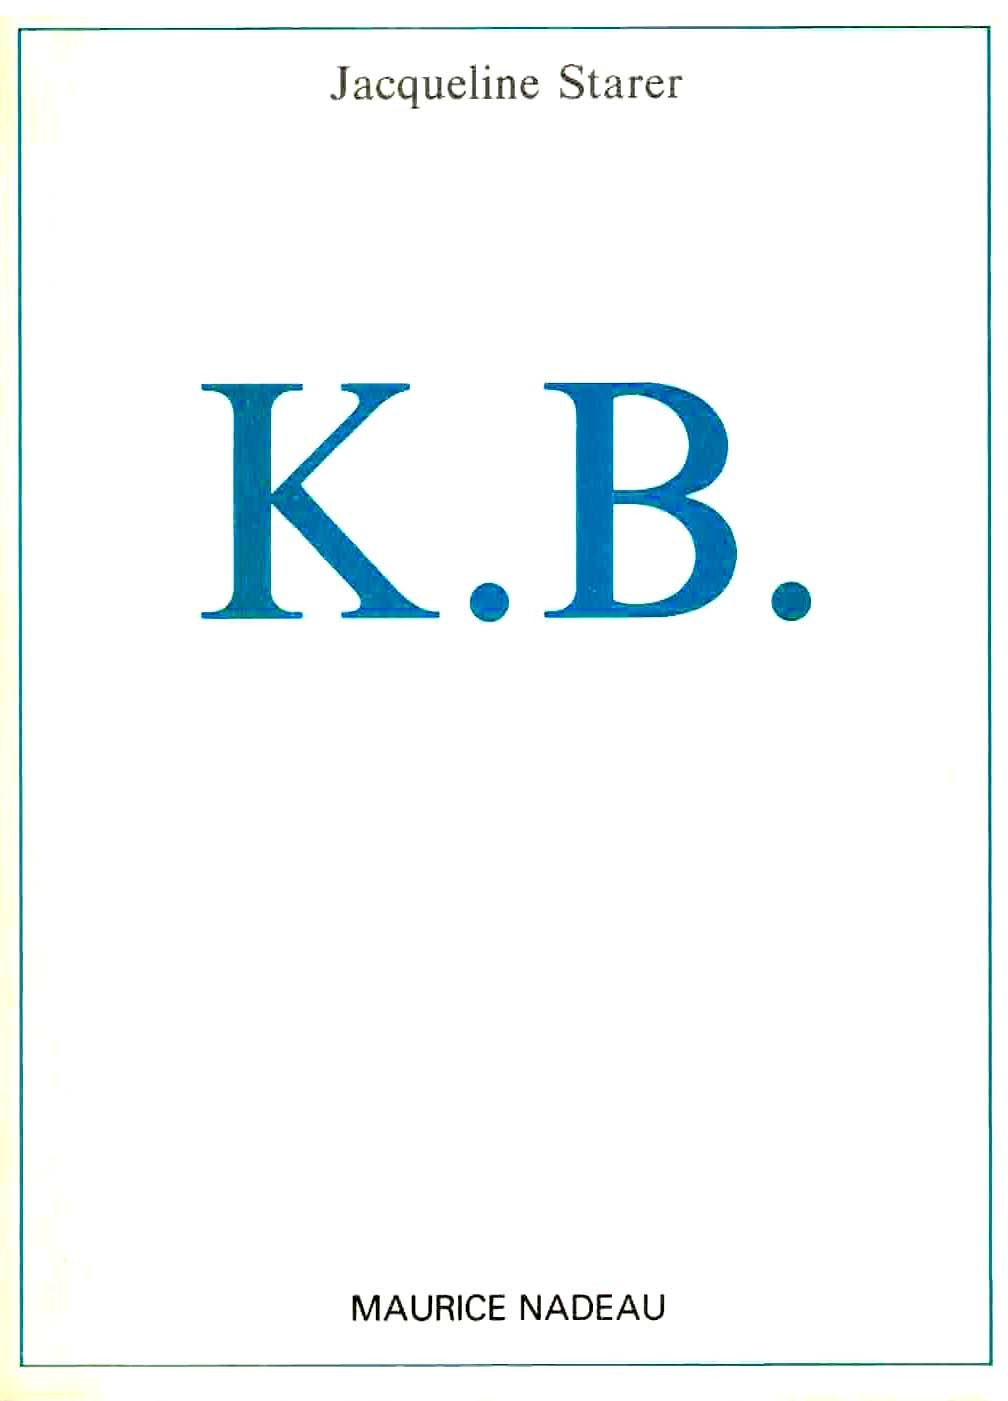 K.B. KEITH BARNES